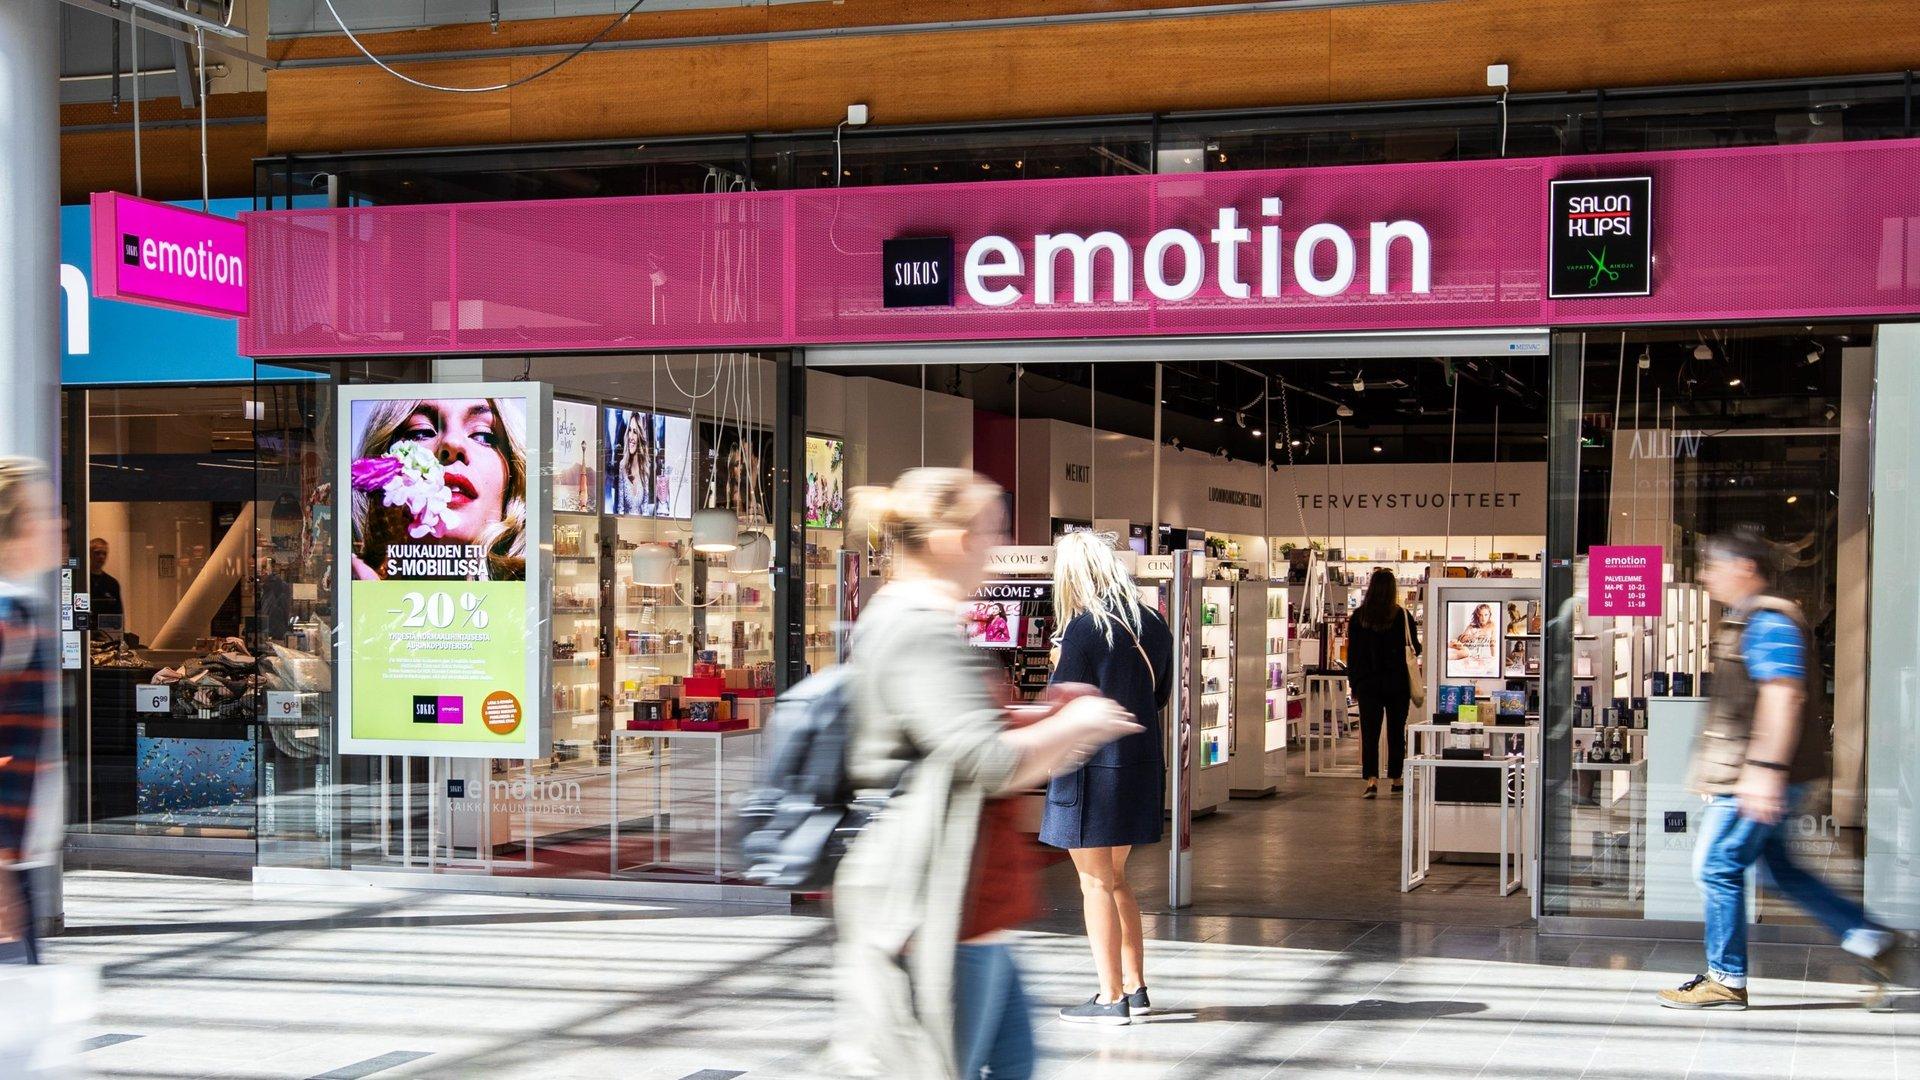 Sokos Emotion digitaalinen mainosratkaisu